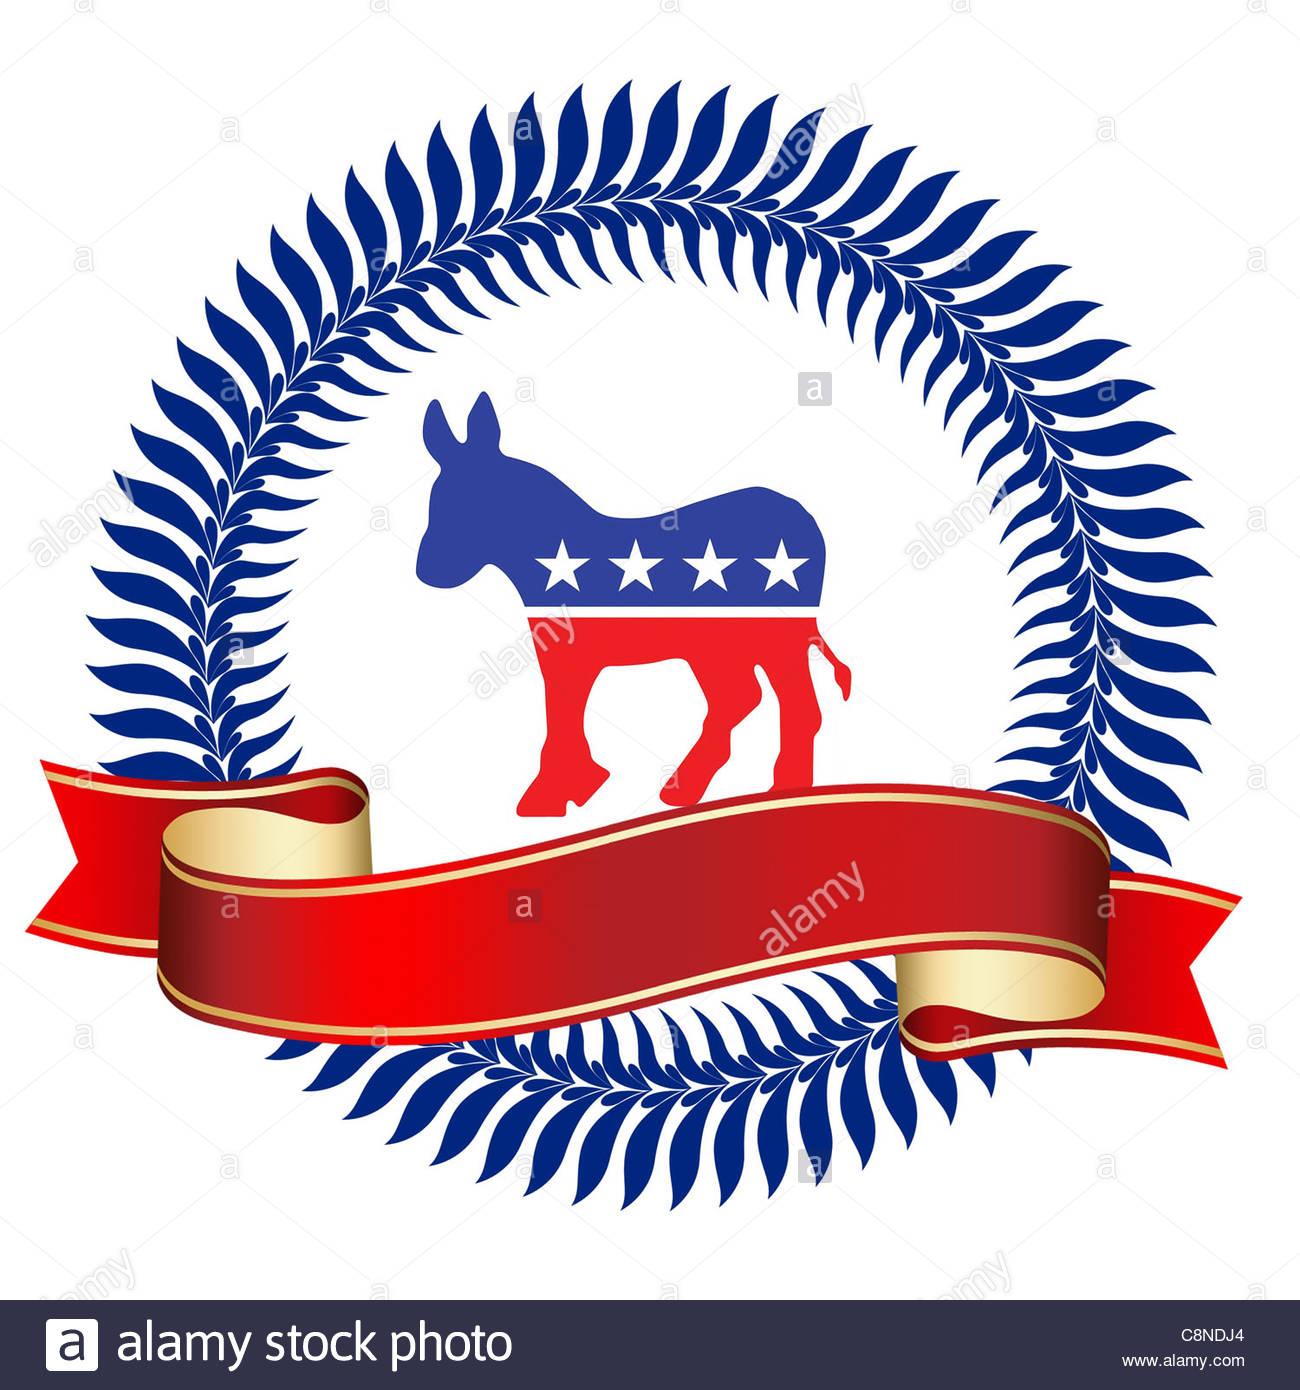 Democrats - Stock Image